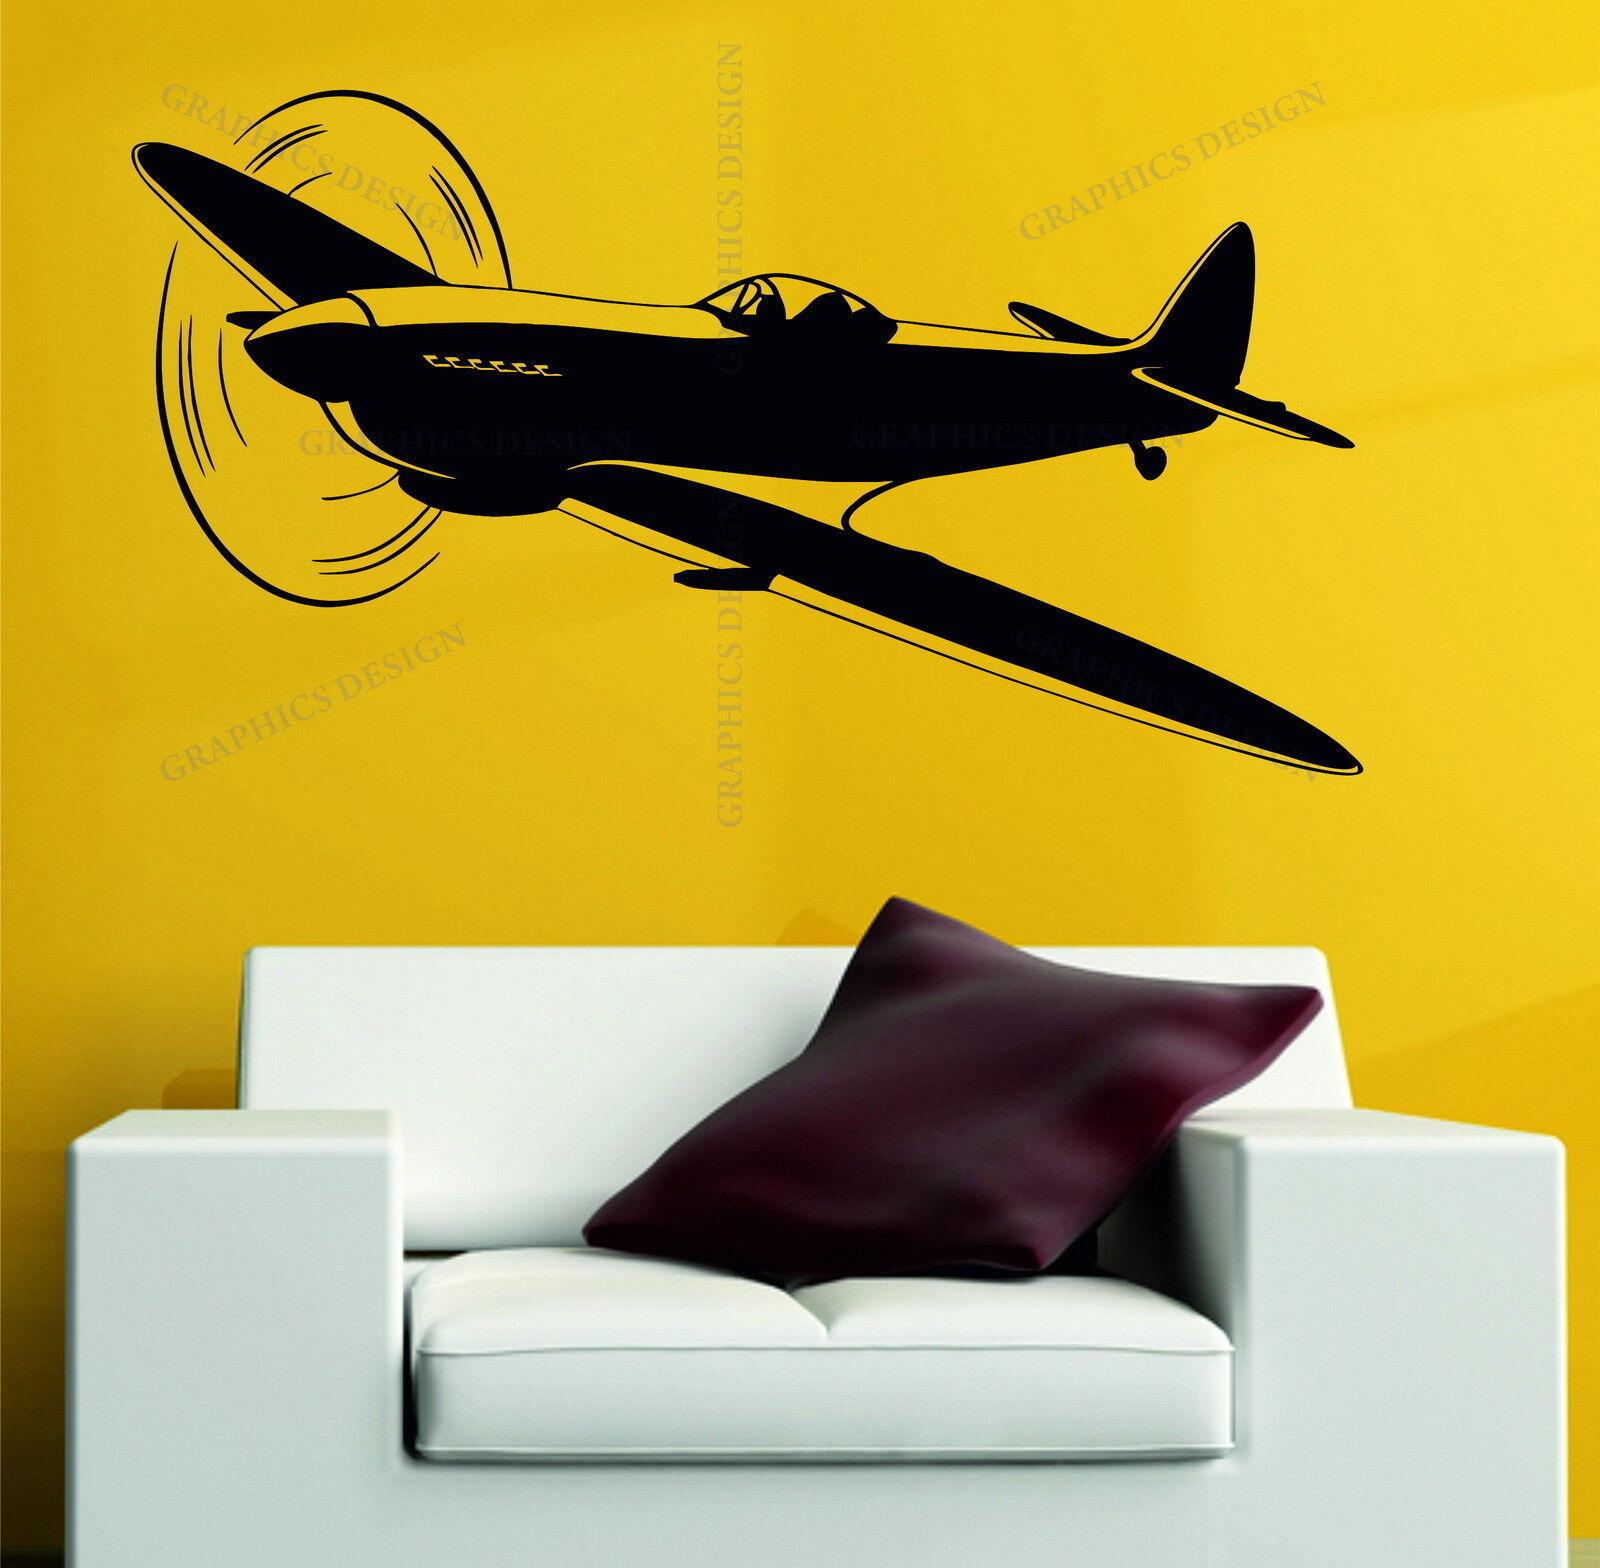 Spitfire Plane Army WW2 RAF Airplane Decor Vinyl Wall Sticker Decal ...